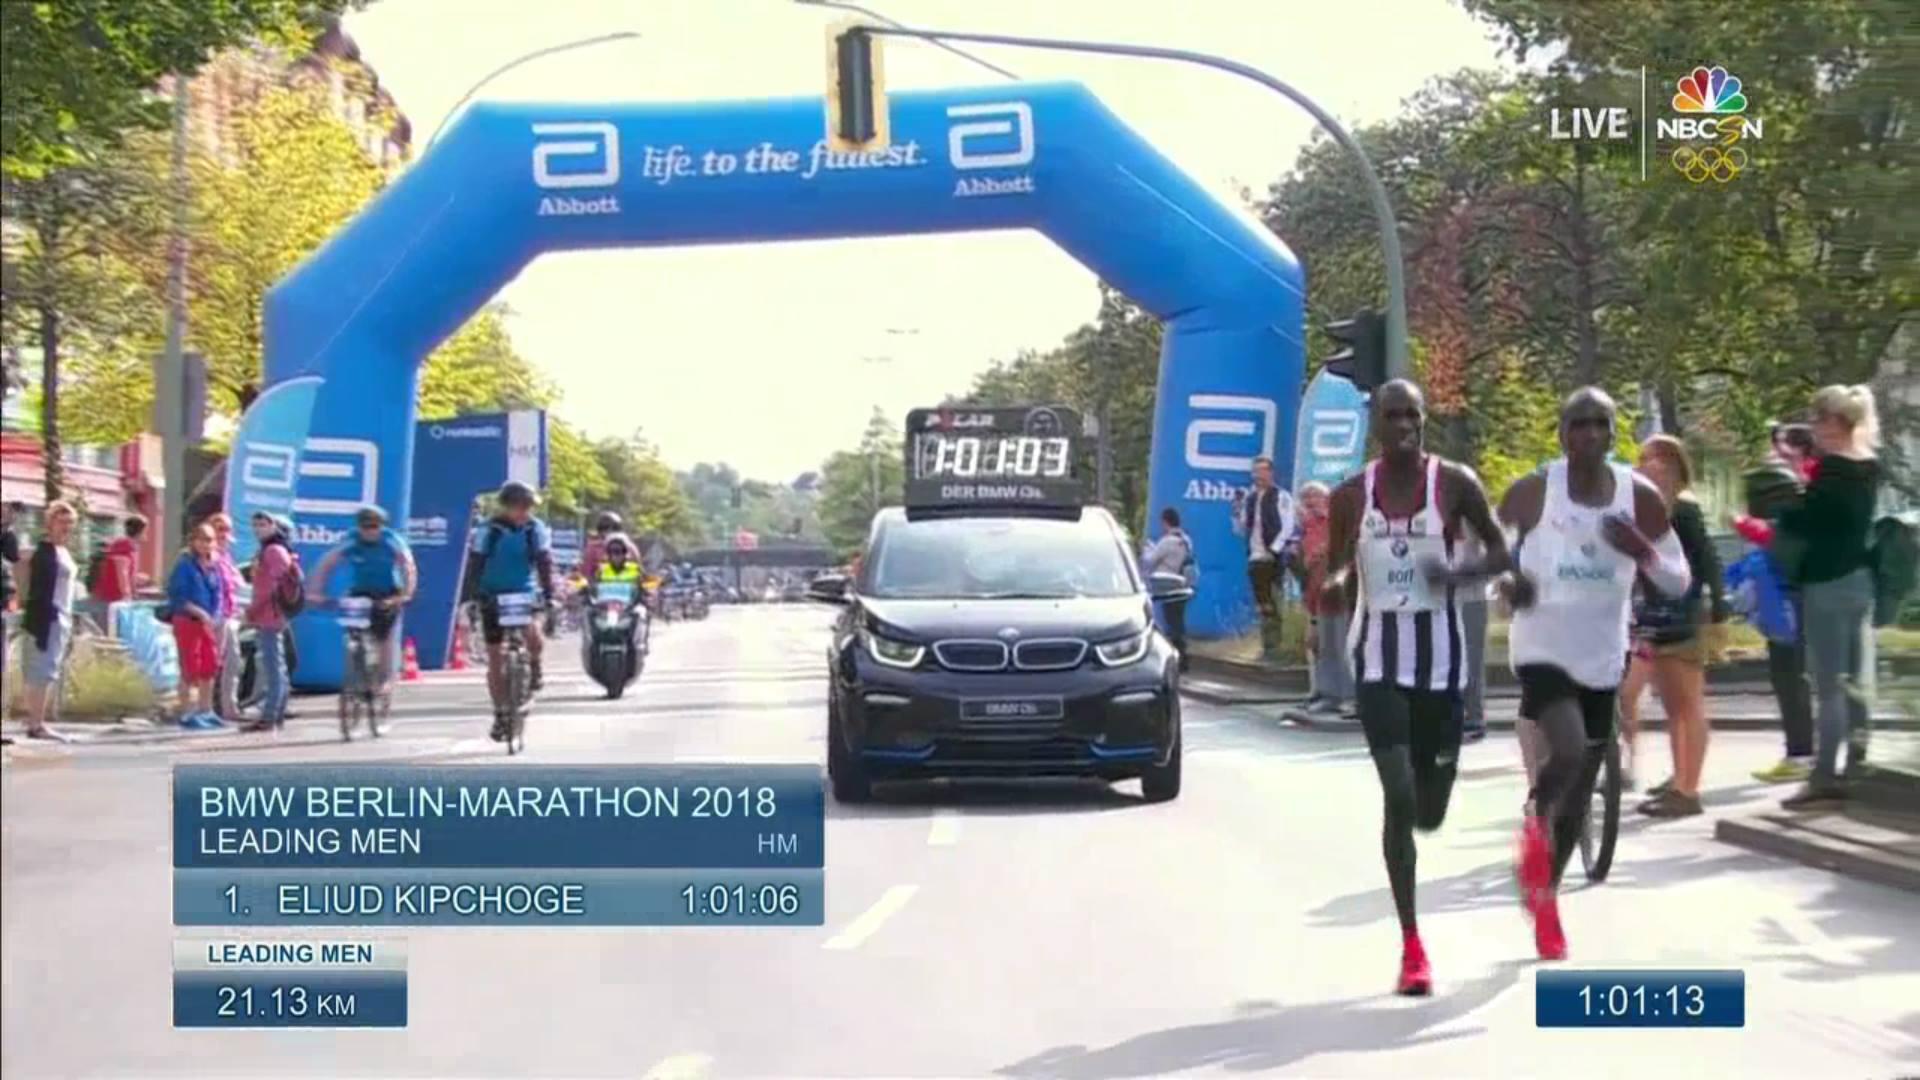 fot. Berlin Marathon Stream NBC live